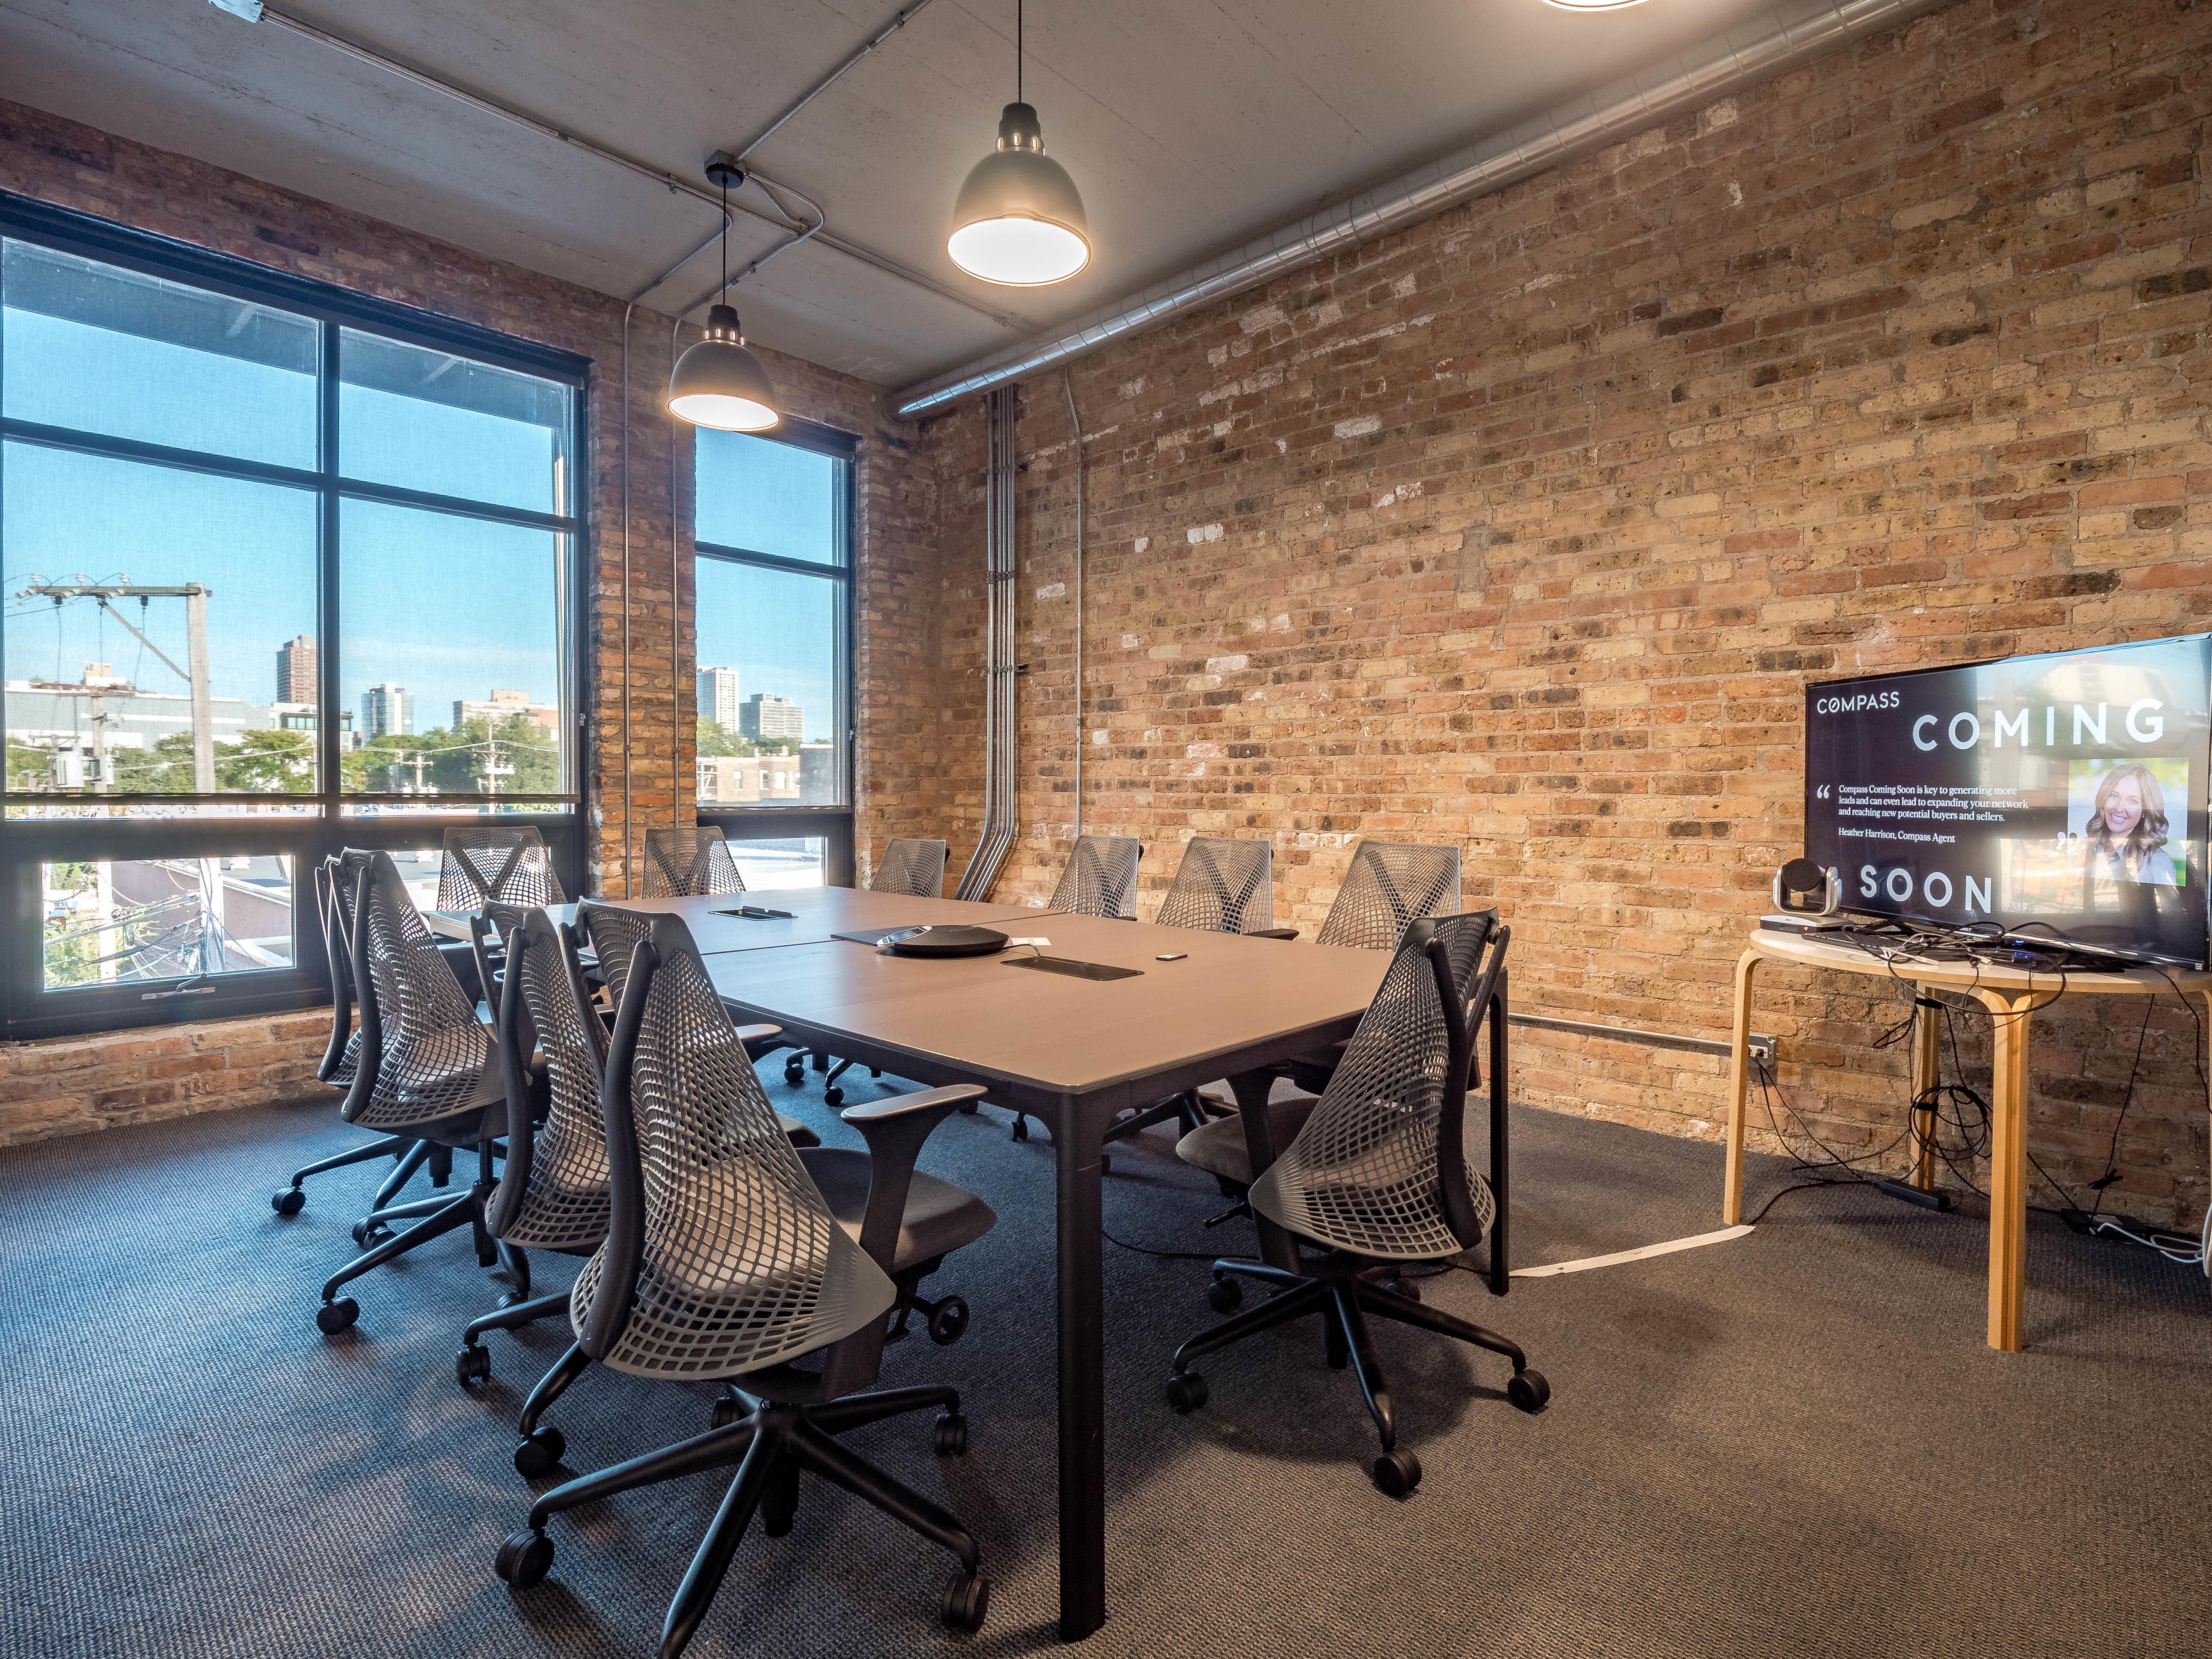 DeskLabs - The Conference Room